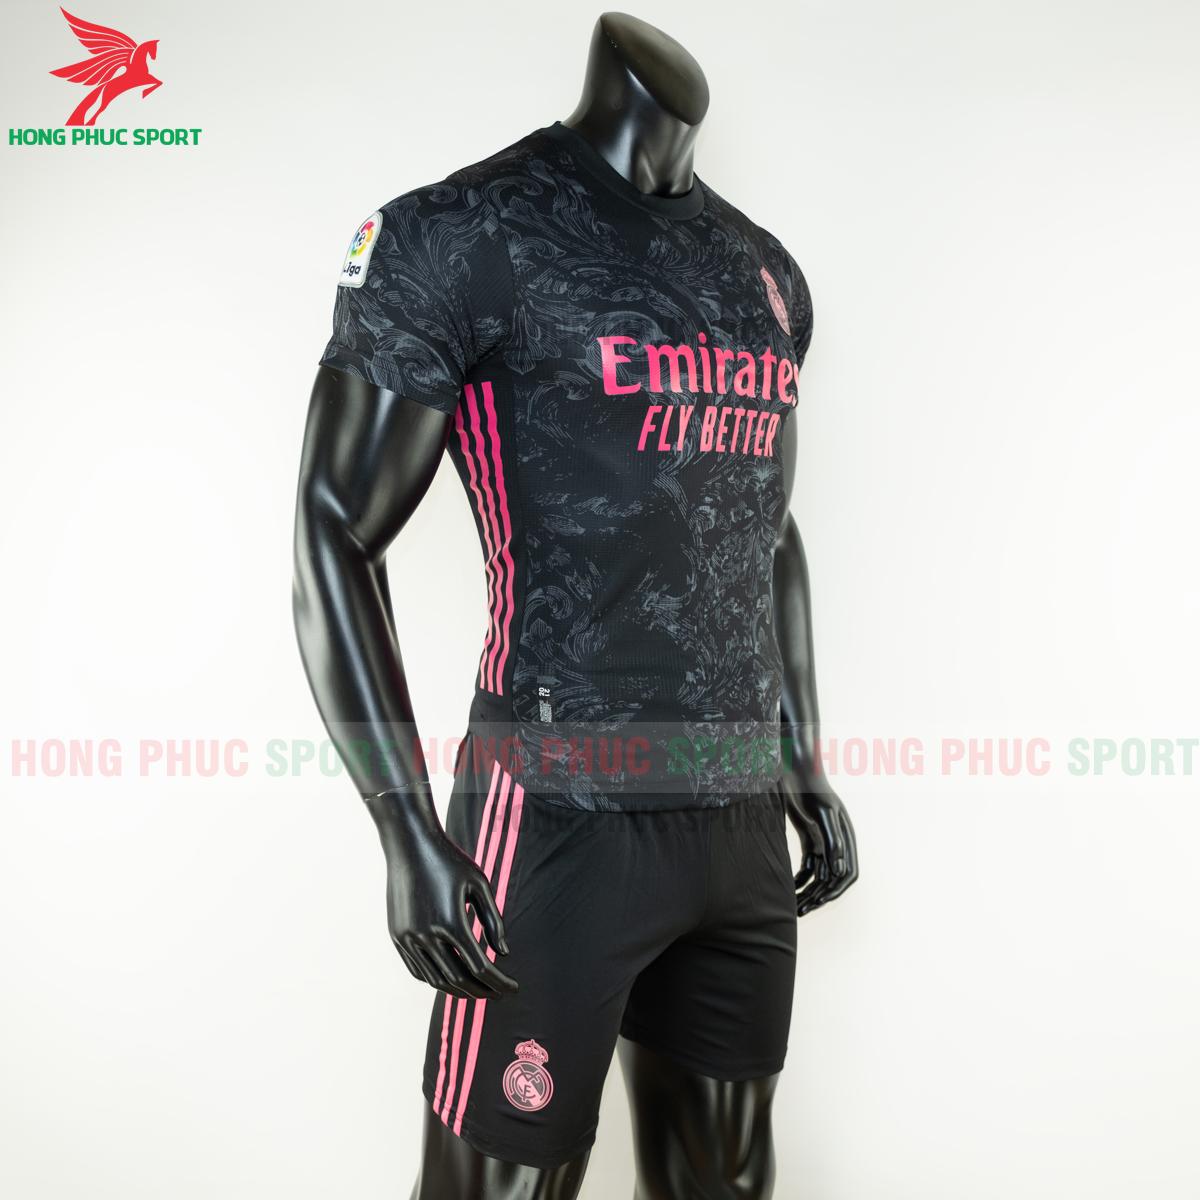 https://cdn.hongphucsport.com/unsafe/s4.shopbay.vn/files/285/ao-bong-da-real-madrid-2020-2021-mau-thu-3-hang-thailand-4-5f8fea5411b42.png